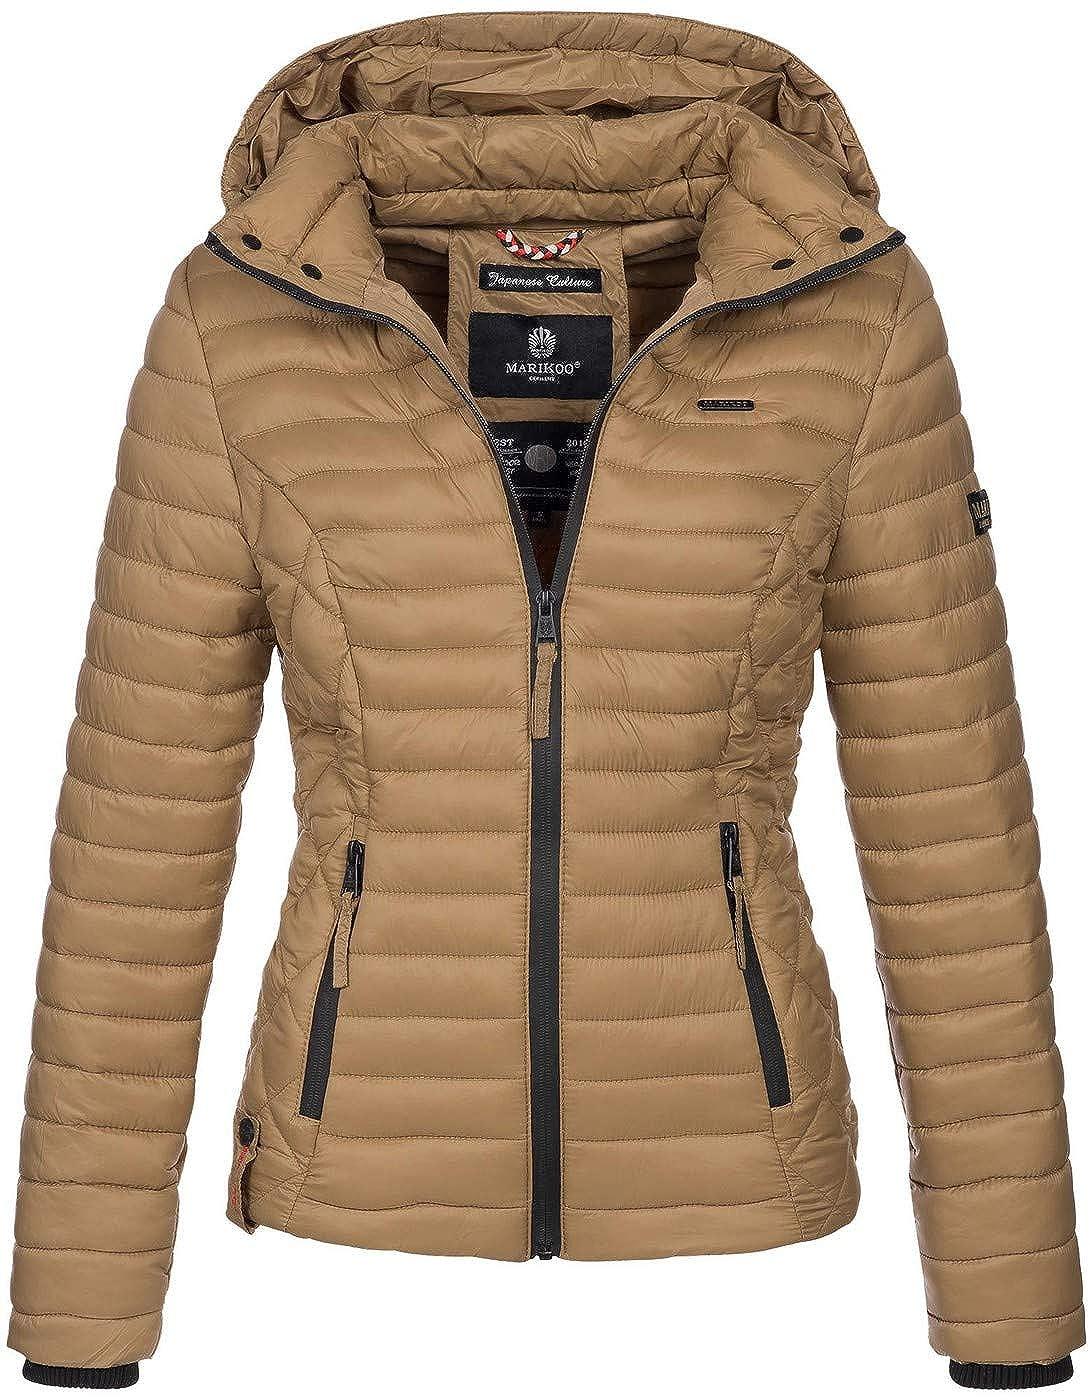 Marikoo Damen Jacke Steppjacke /Übergangsjacke mit Kapuze gesteppt B600